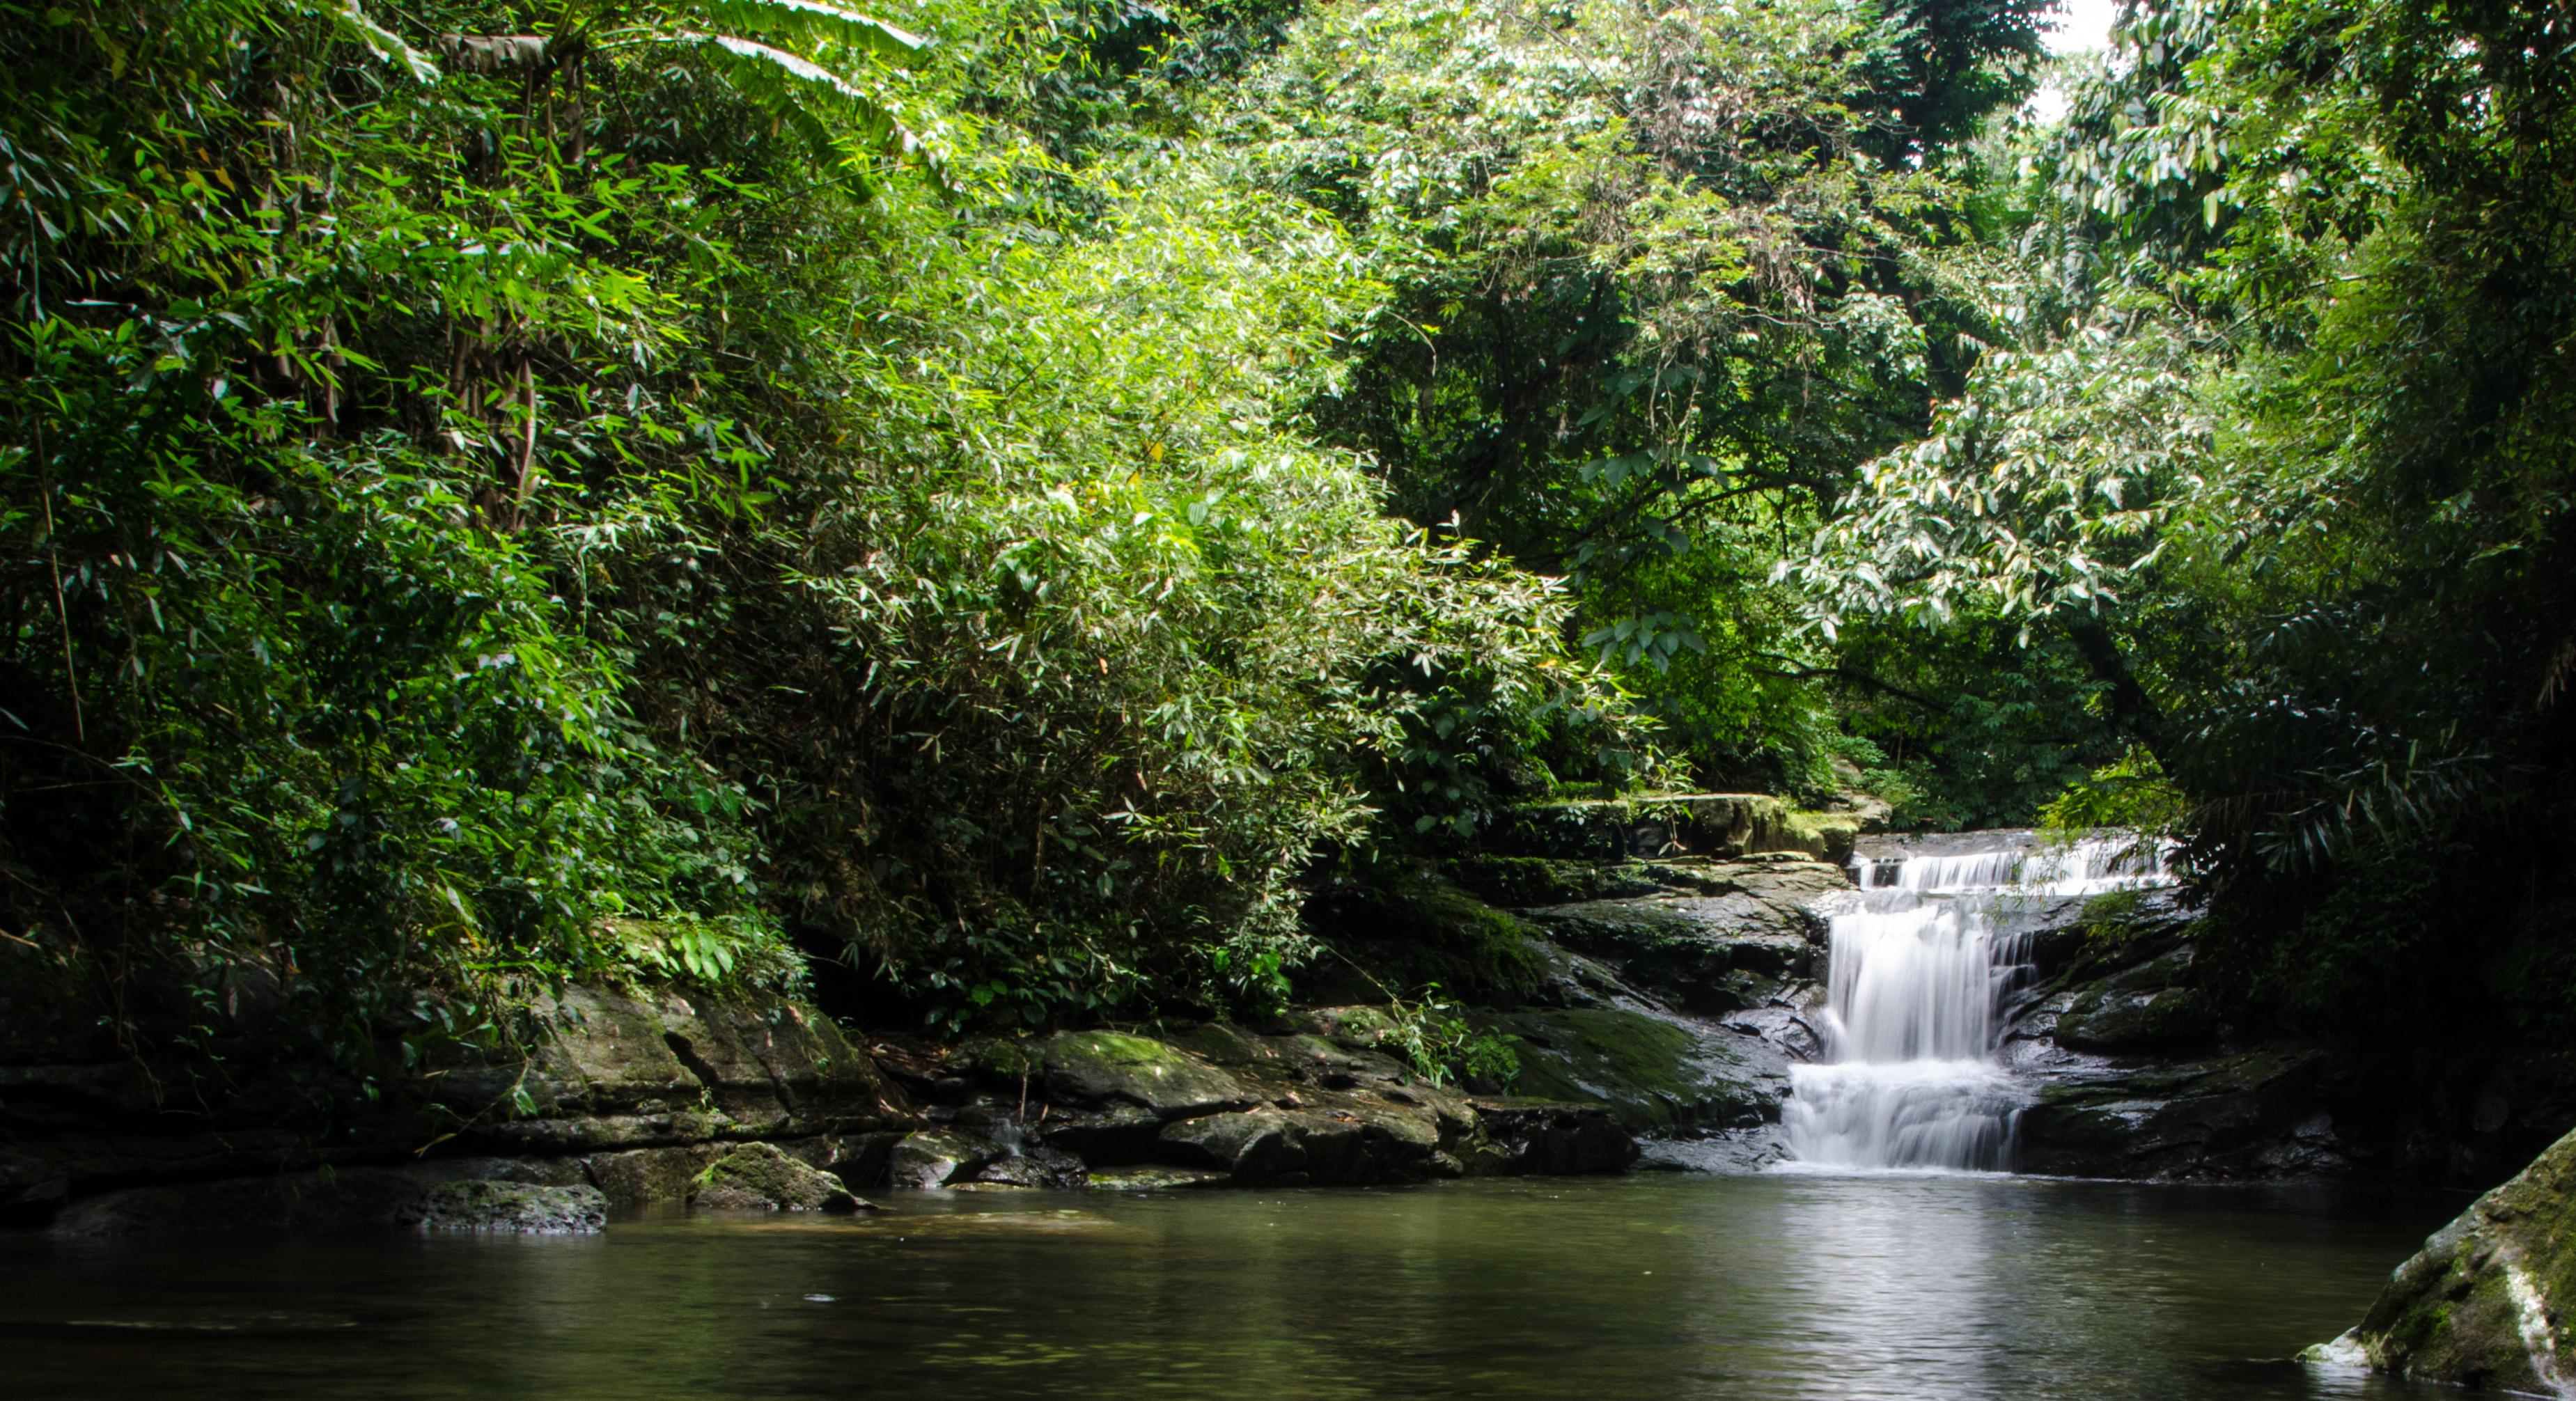 file waterfalls in the backyard 7344210442 jpg wikimedia commons